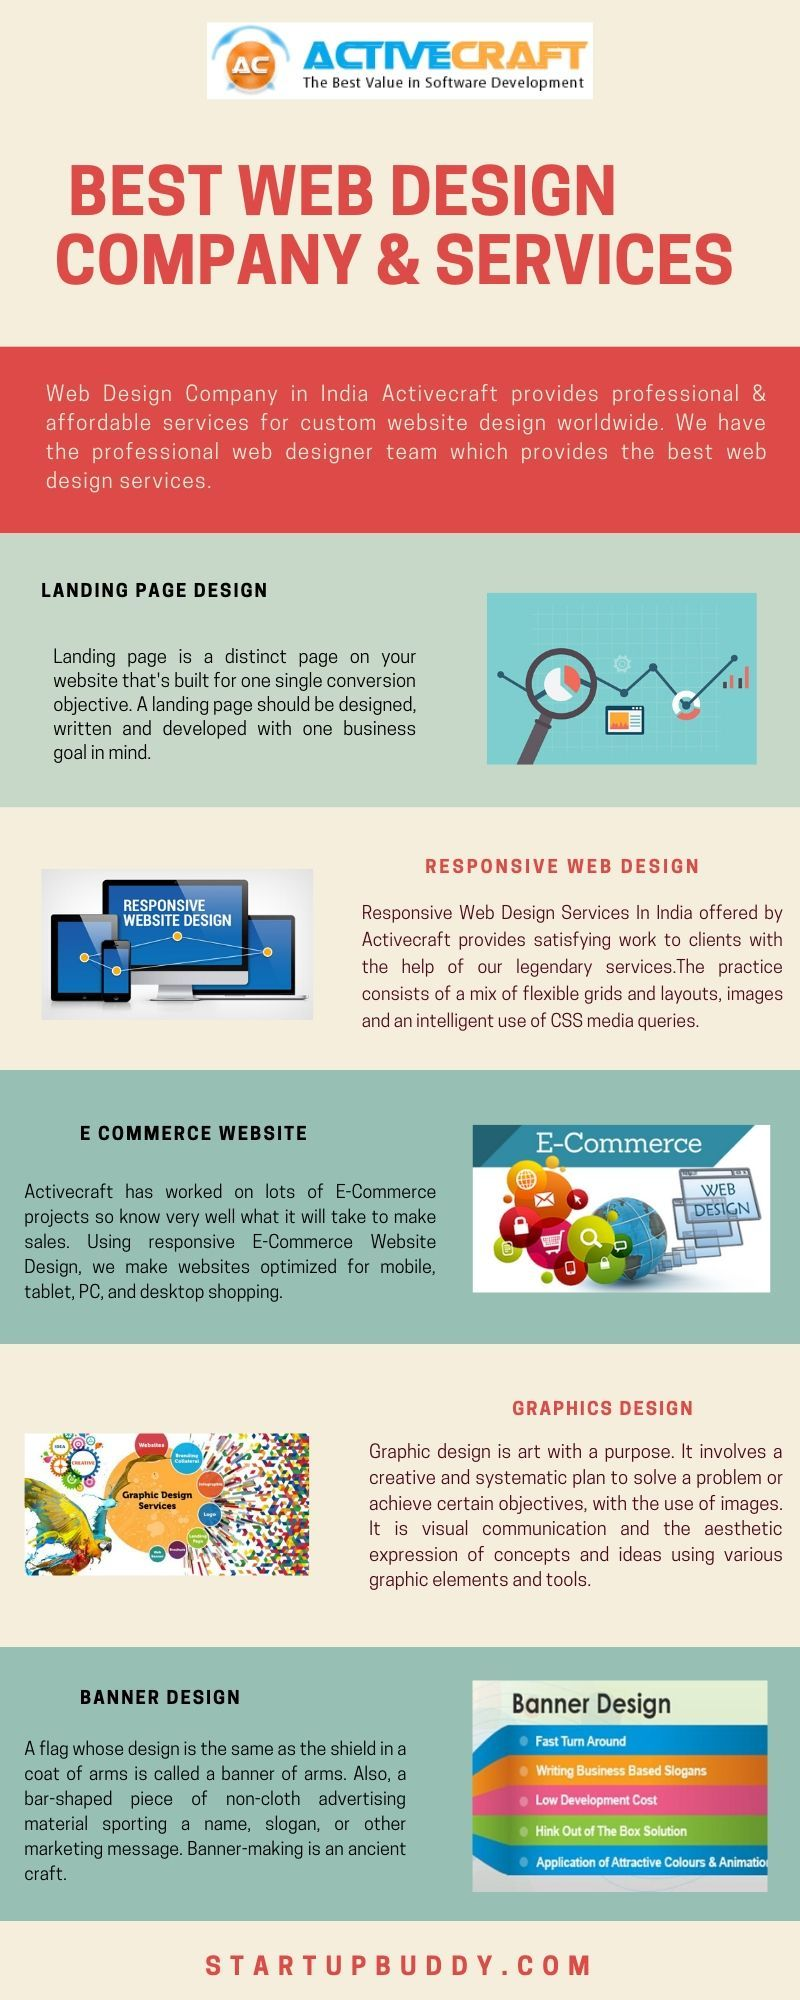 Best Web Design Company Services In 2020 Web Design Web Design Company Web Development Design